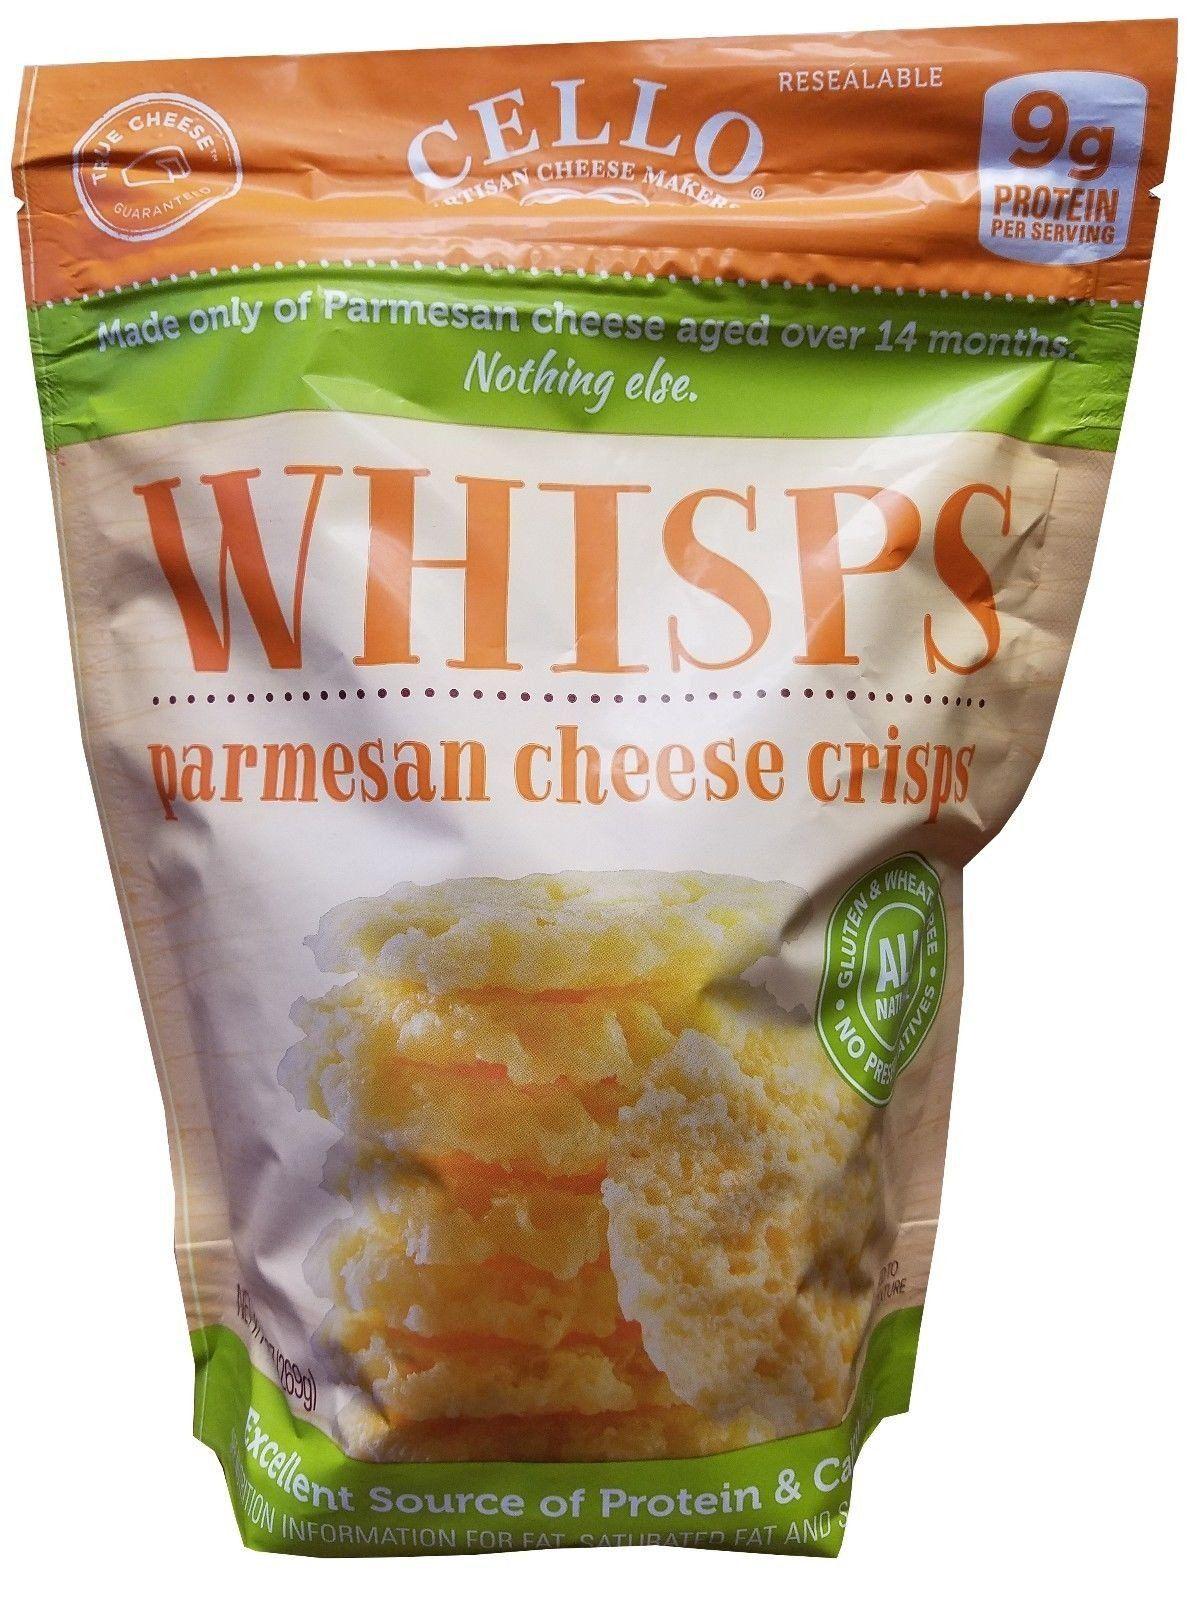 e0fa53b6a0c0e Cello Whisps Parmesan Cheese Crisps Artisan Cheese Snack Food 9.5 oz ...